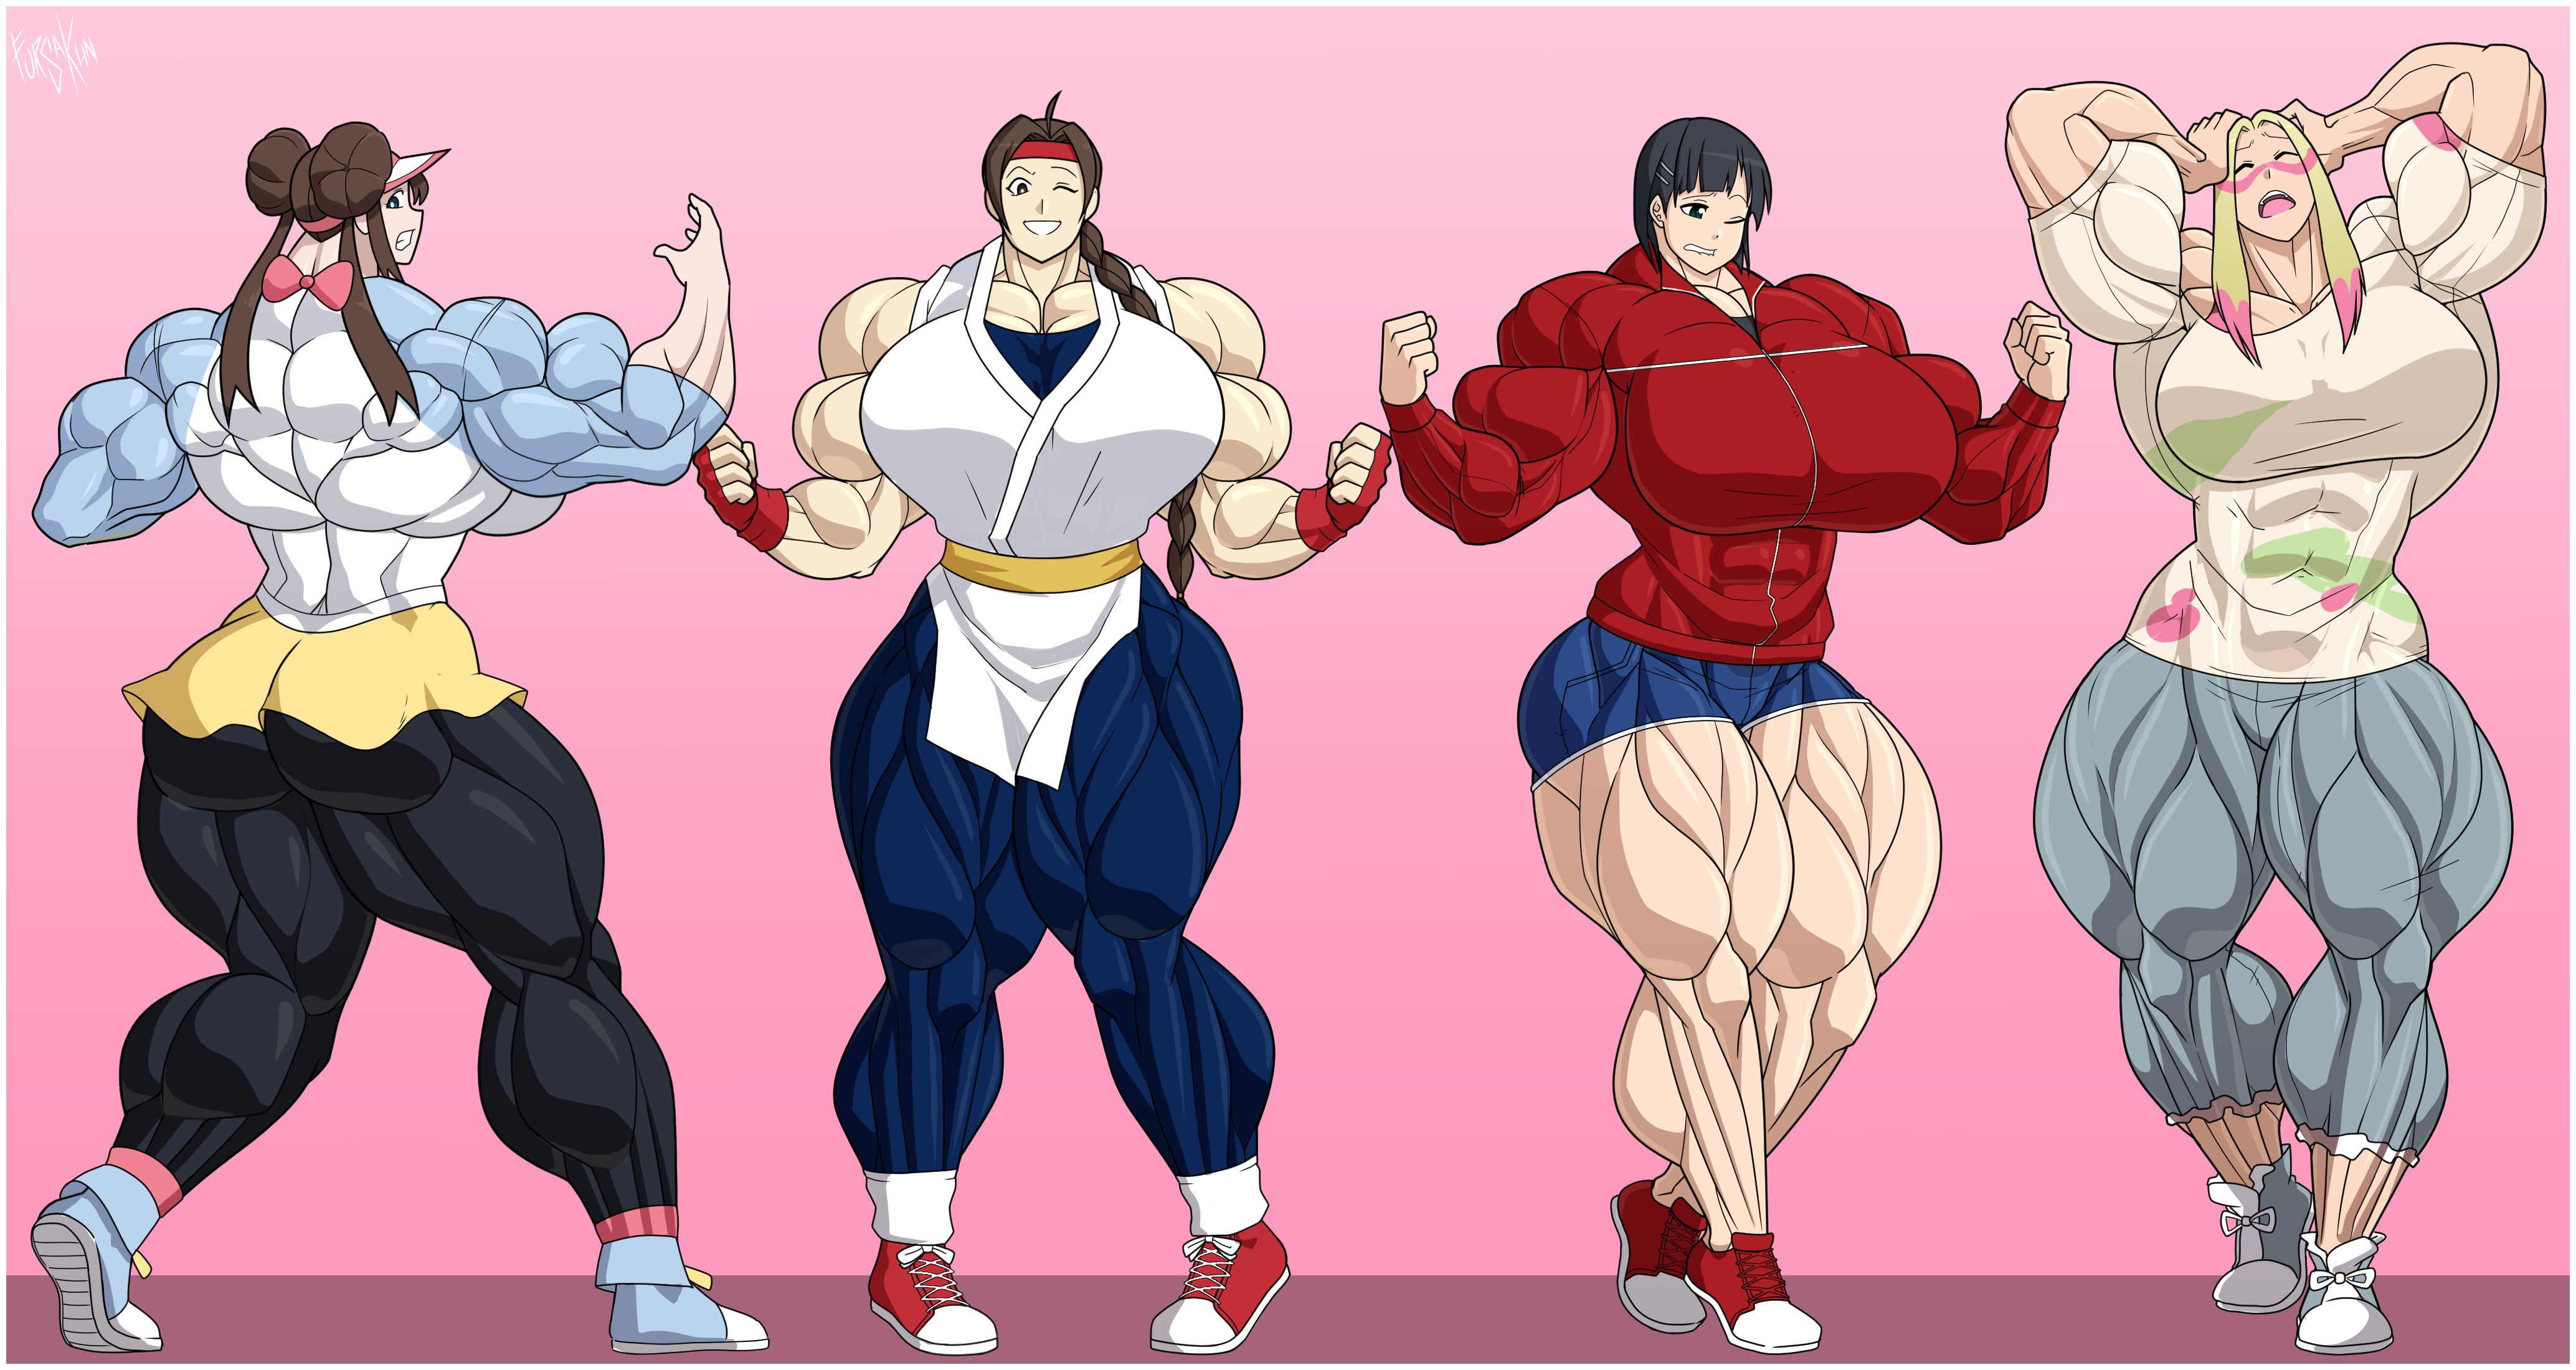 Anime Girl Growth commission - growth spurtsforsa-kun on deviantart